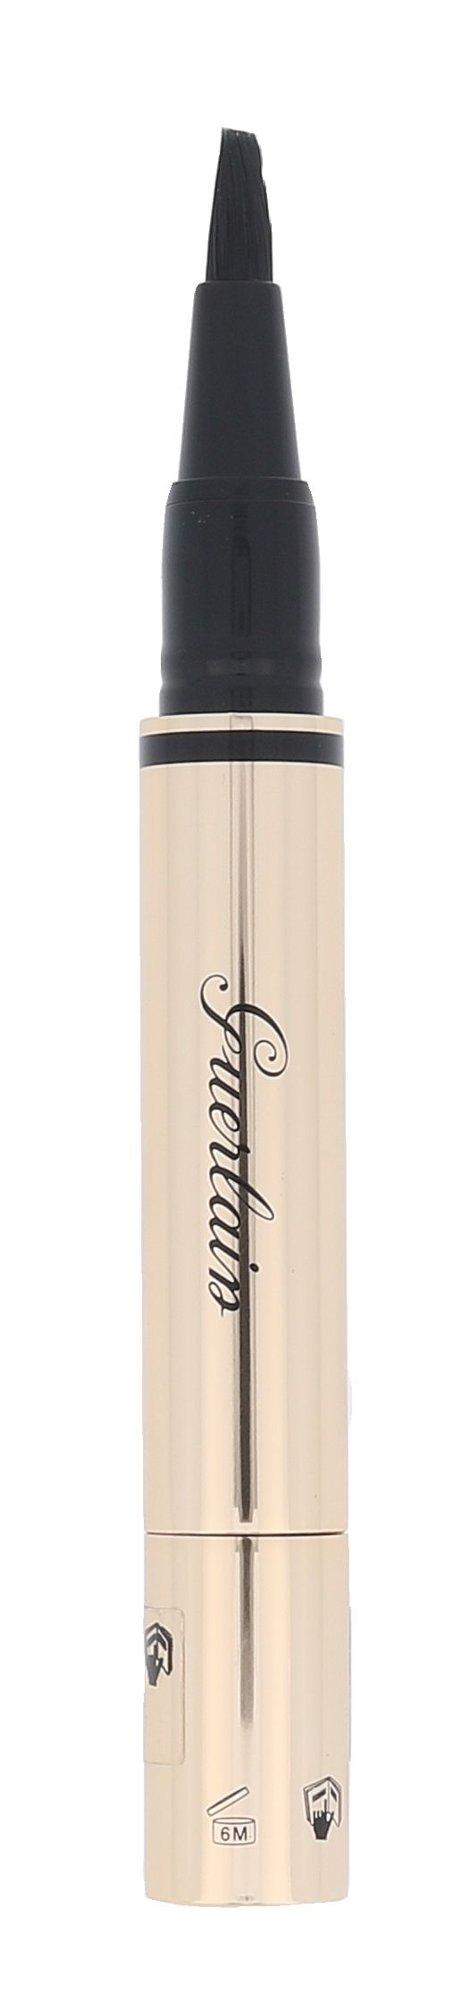 Guerlain Precious Light Cosmetic 1,5ml 01